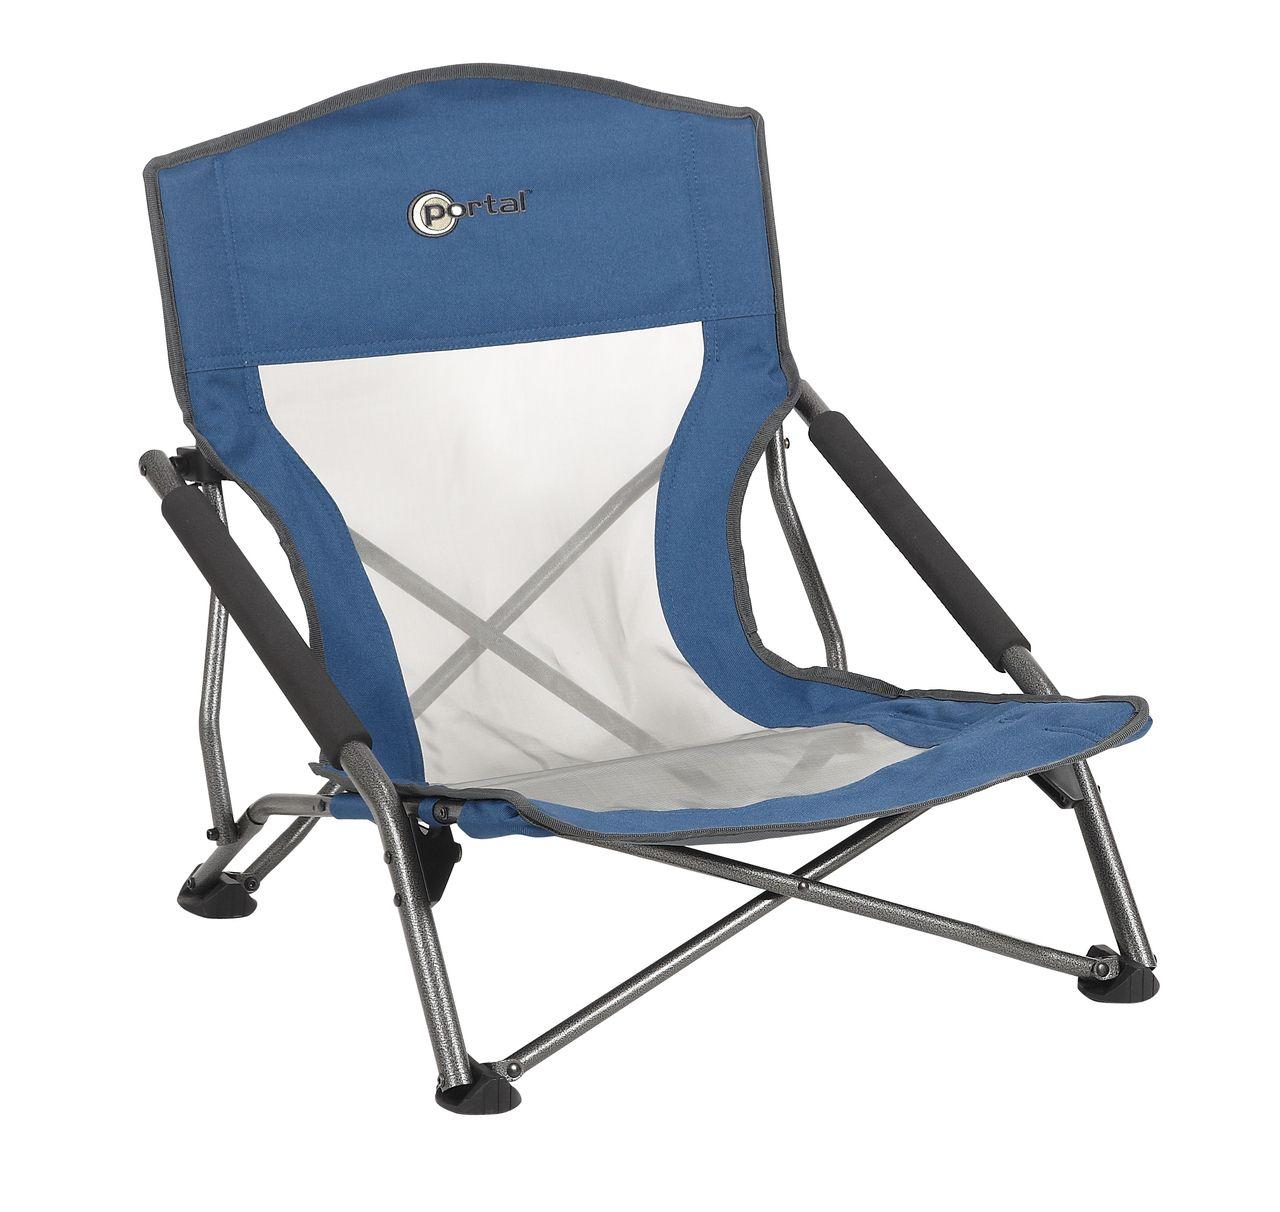 Jax Mercantile Co Portal Quick Quad Event Chair